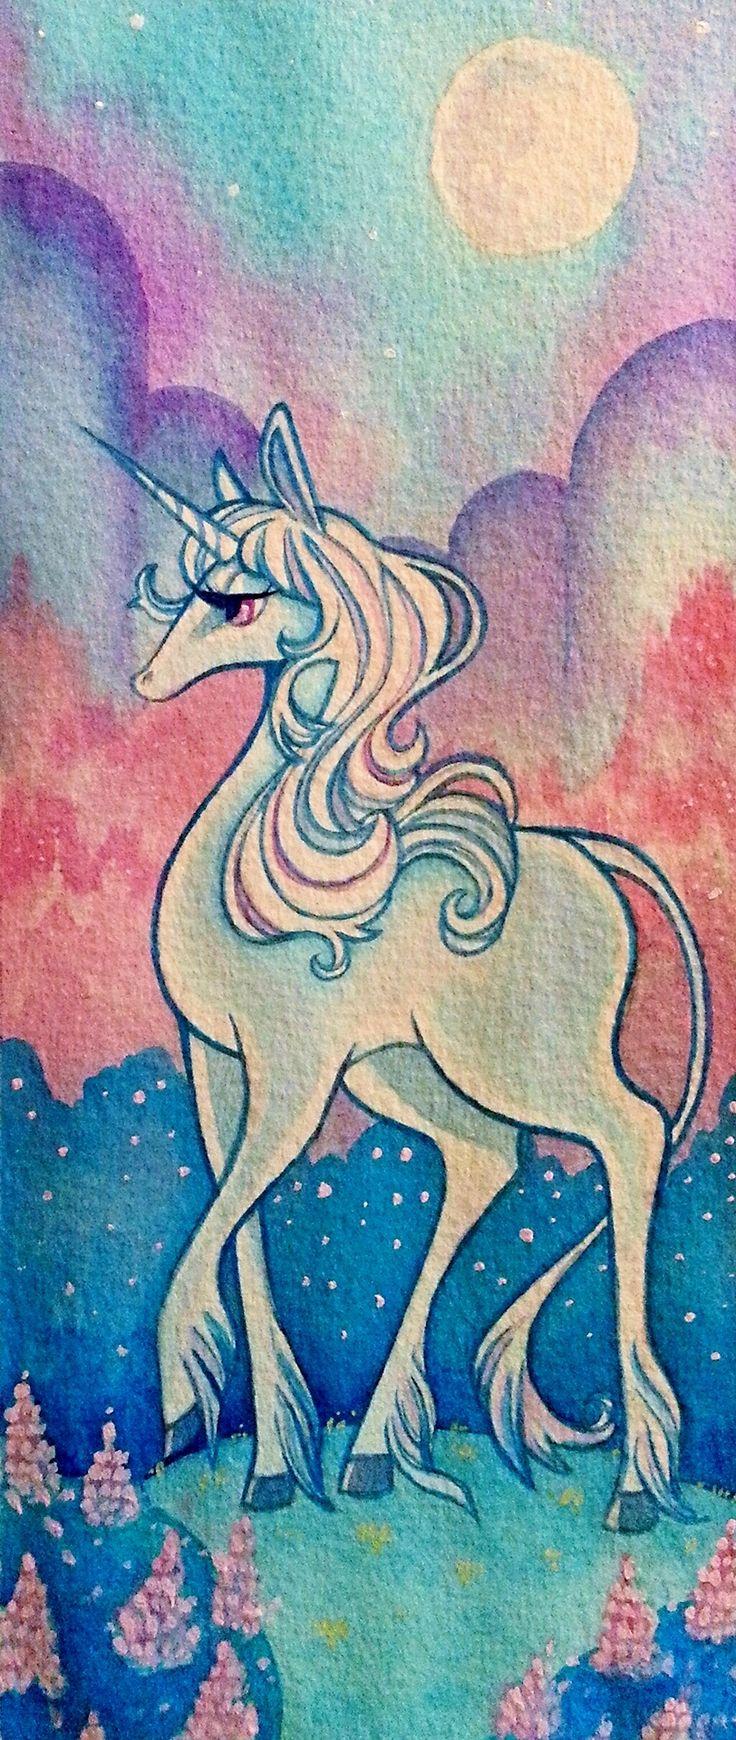 +The Last Unicorn+ by Tankero